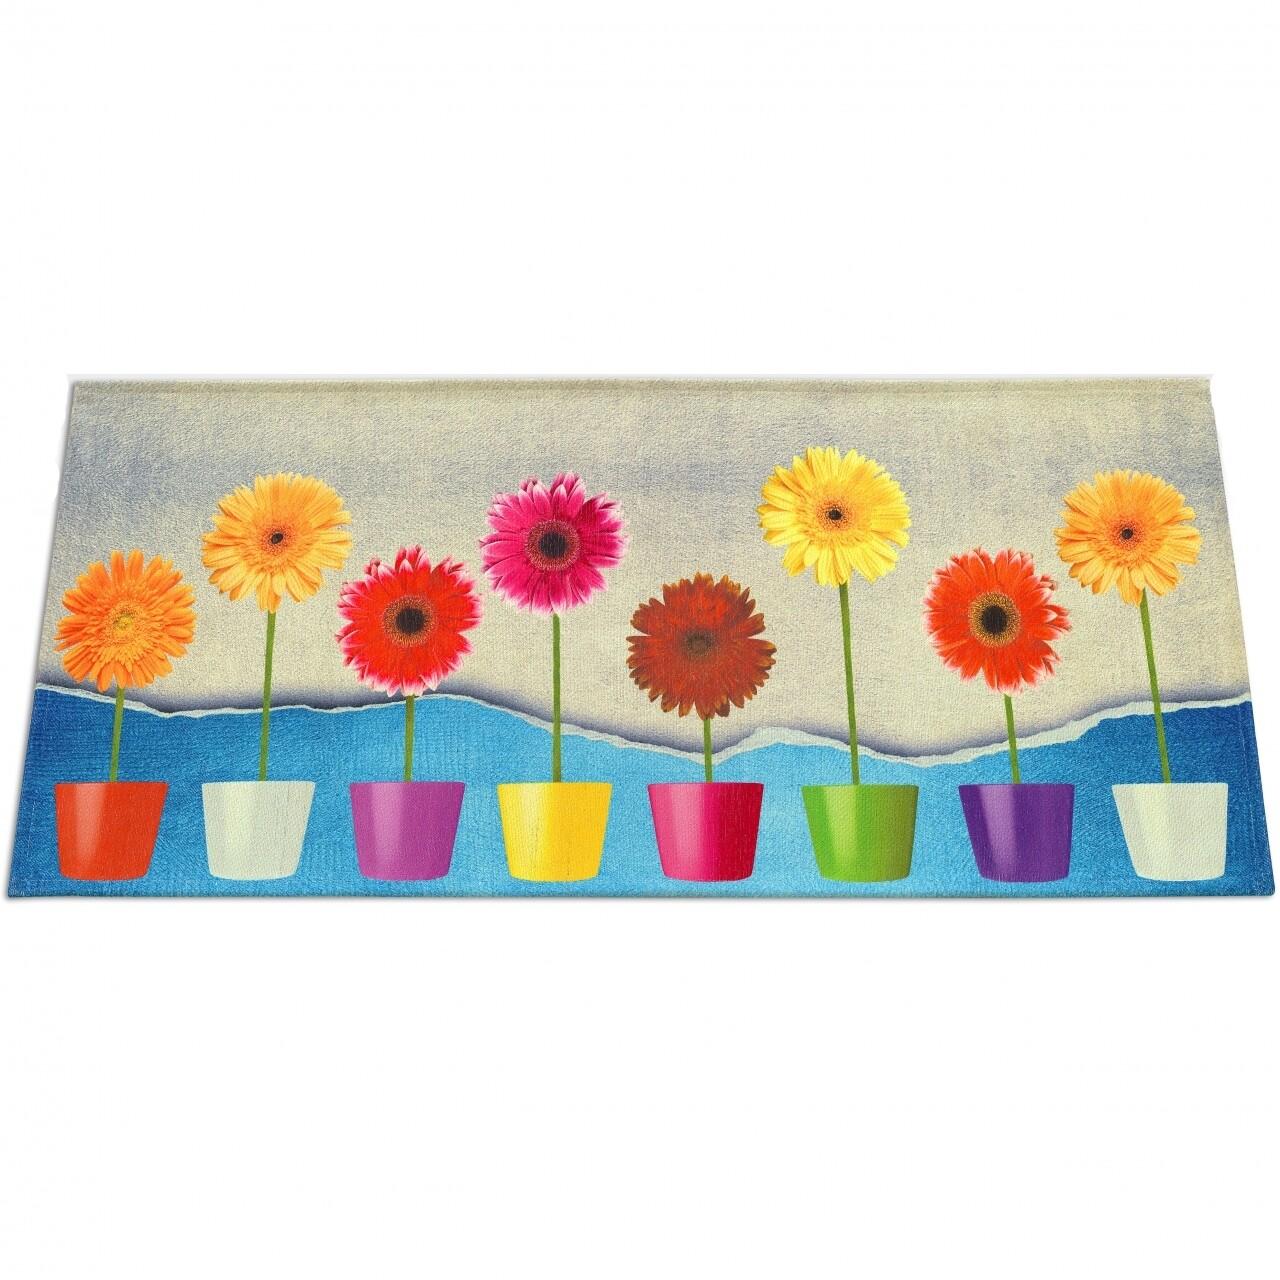 Covor rezistent Webtappeti Flower Power 60 x 140 cm, multicolor